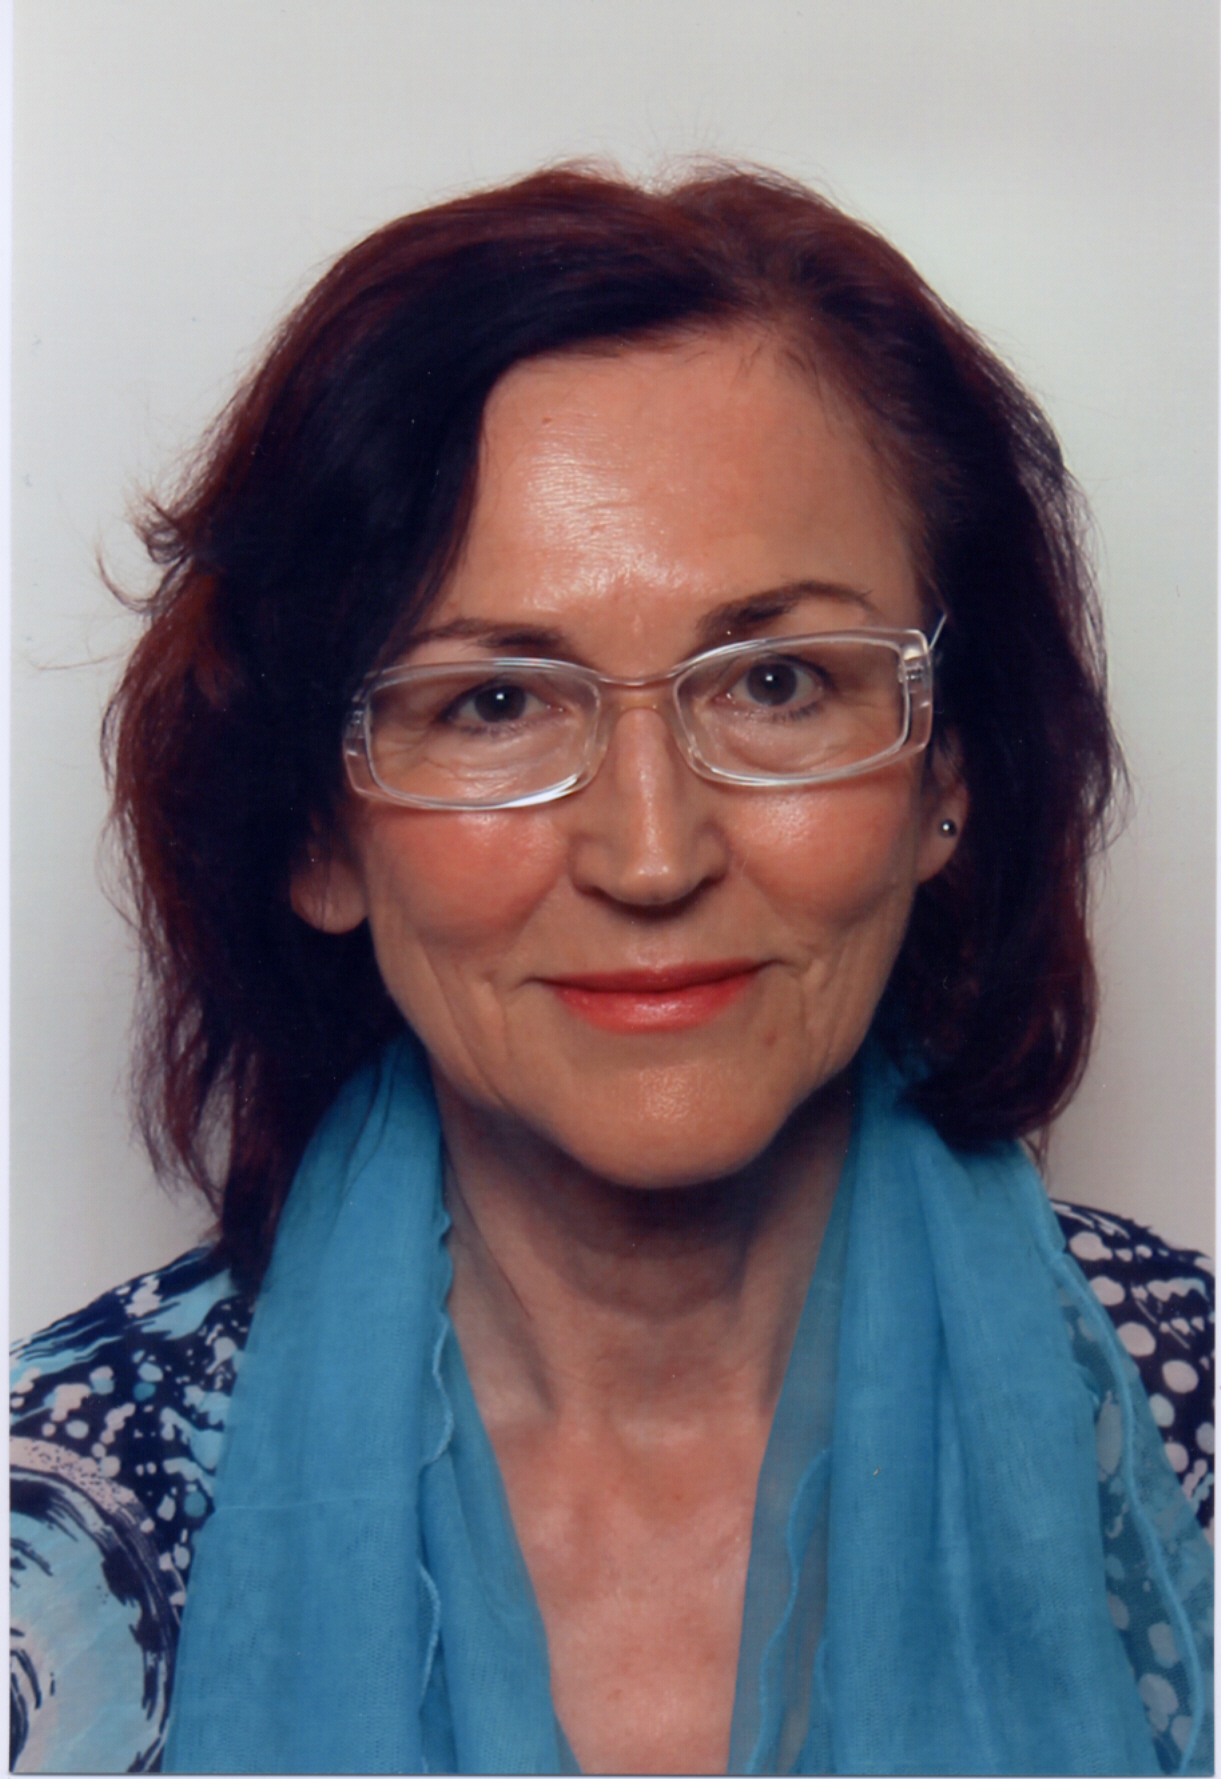 Marta Melniczuk